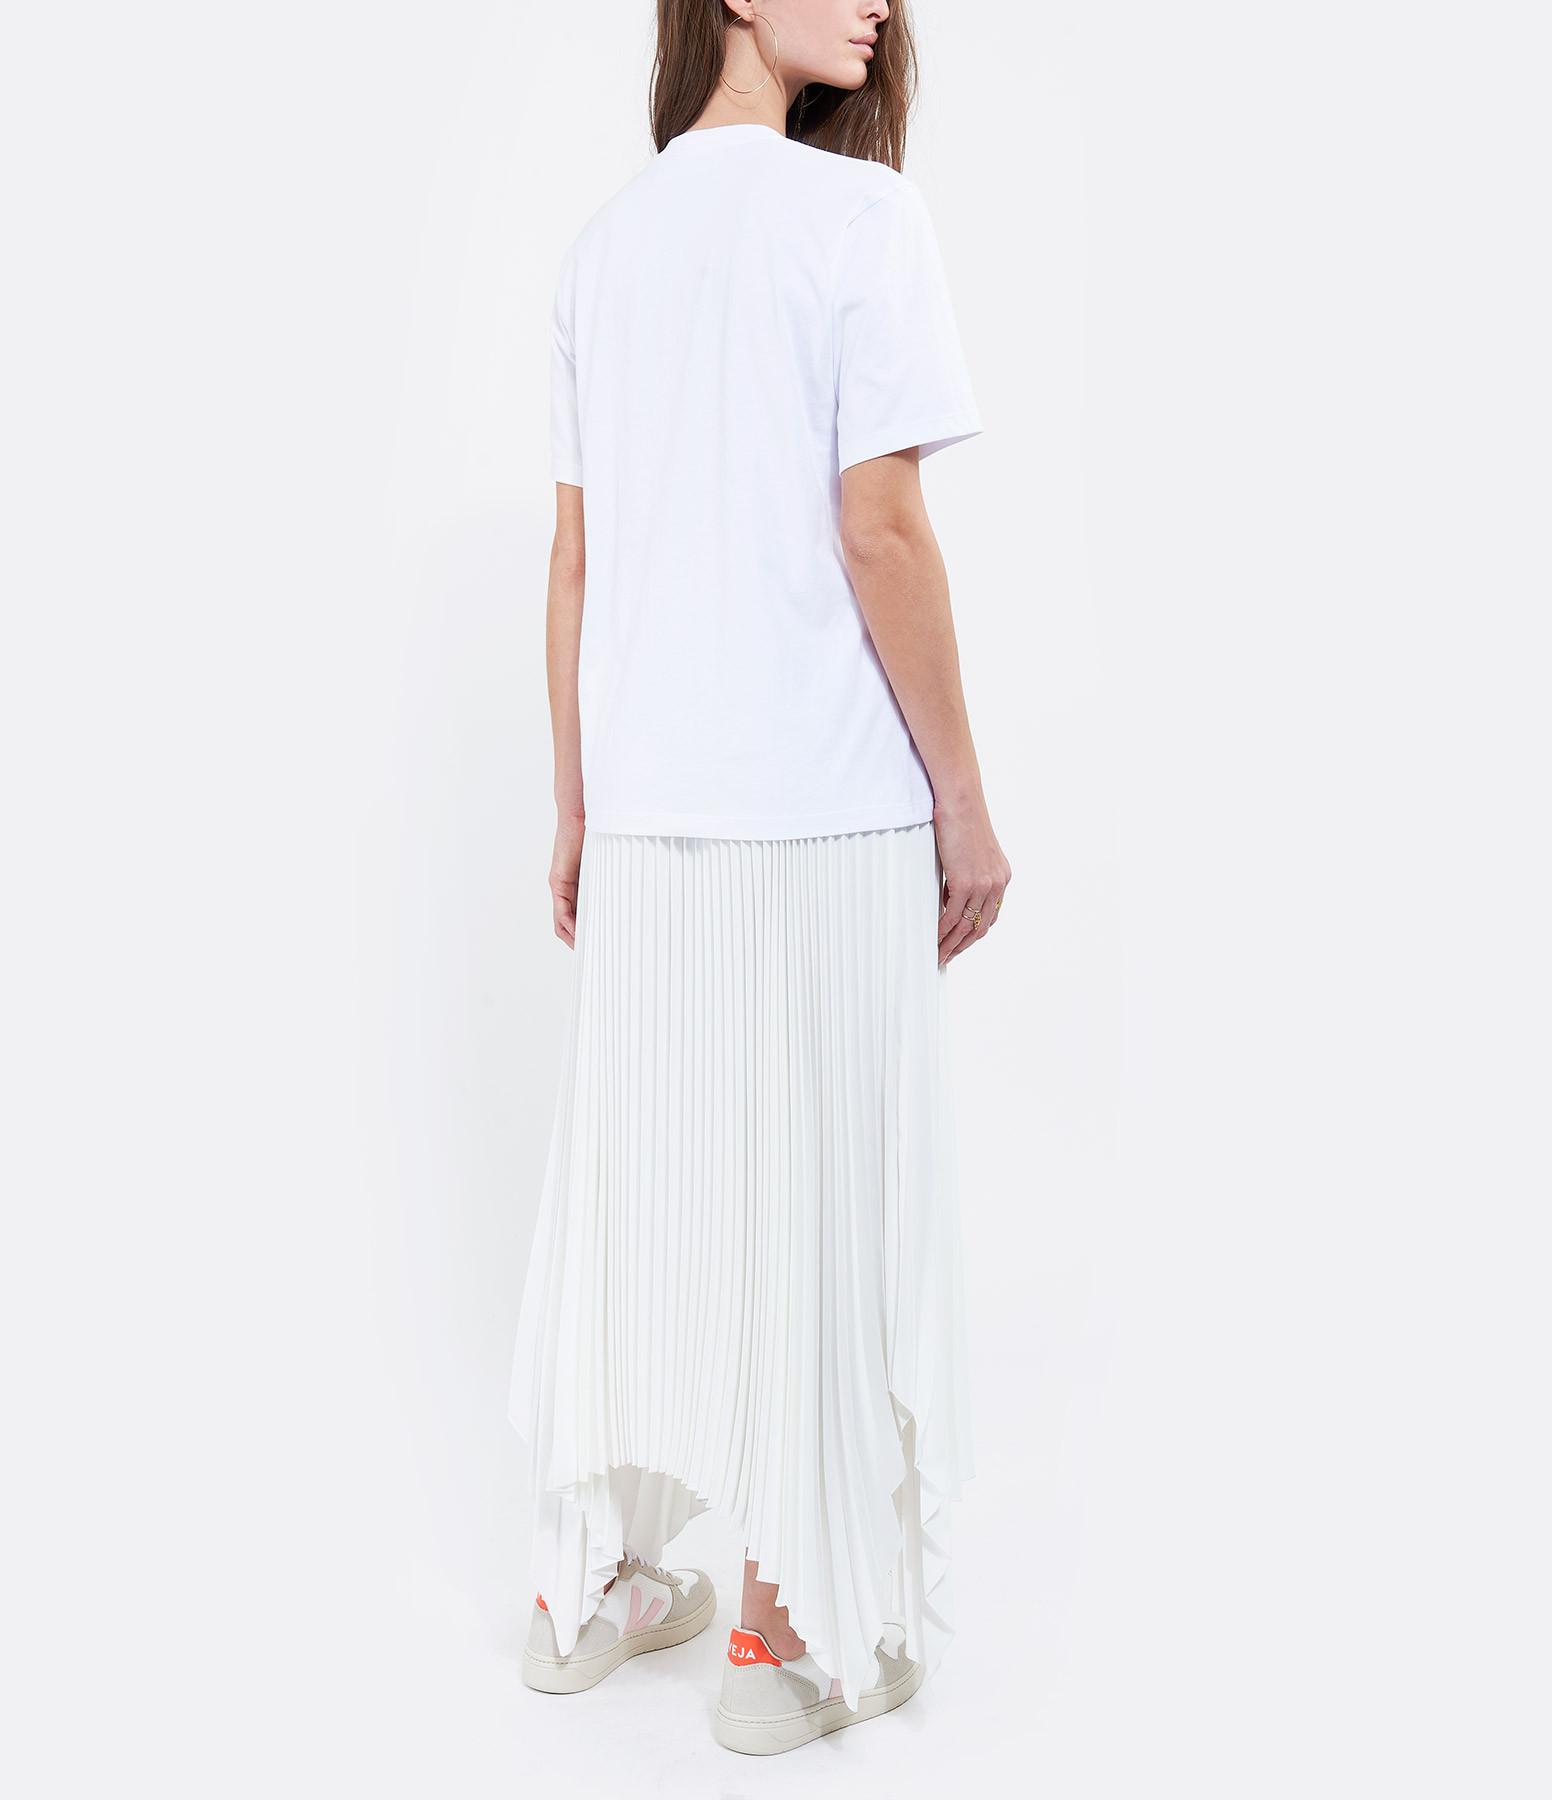 VICTORIA VICTORIA BECKHAM - Tee-shirt I Heart Weekend Coton Blanc